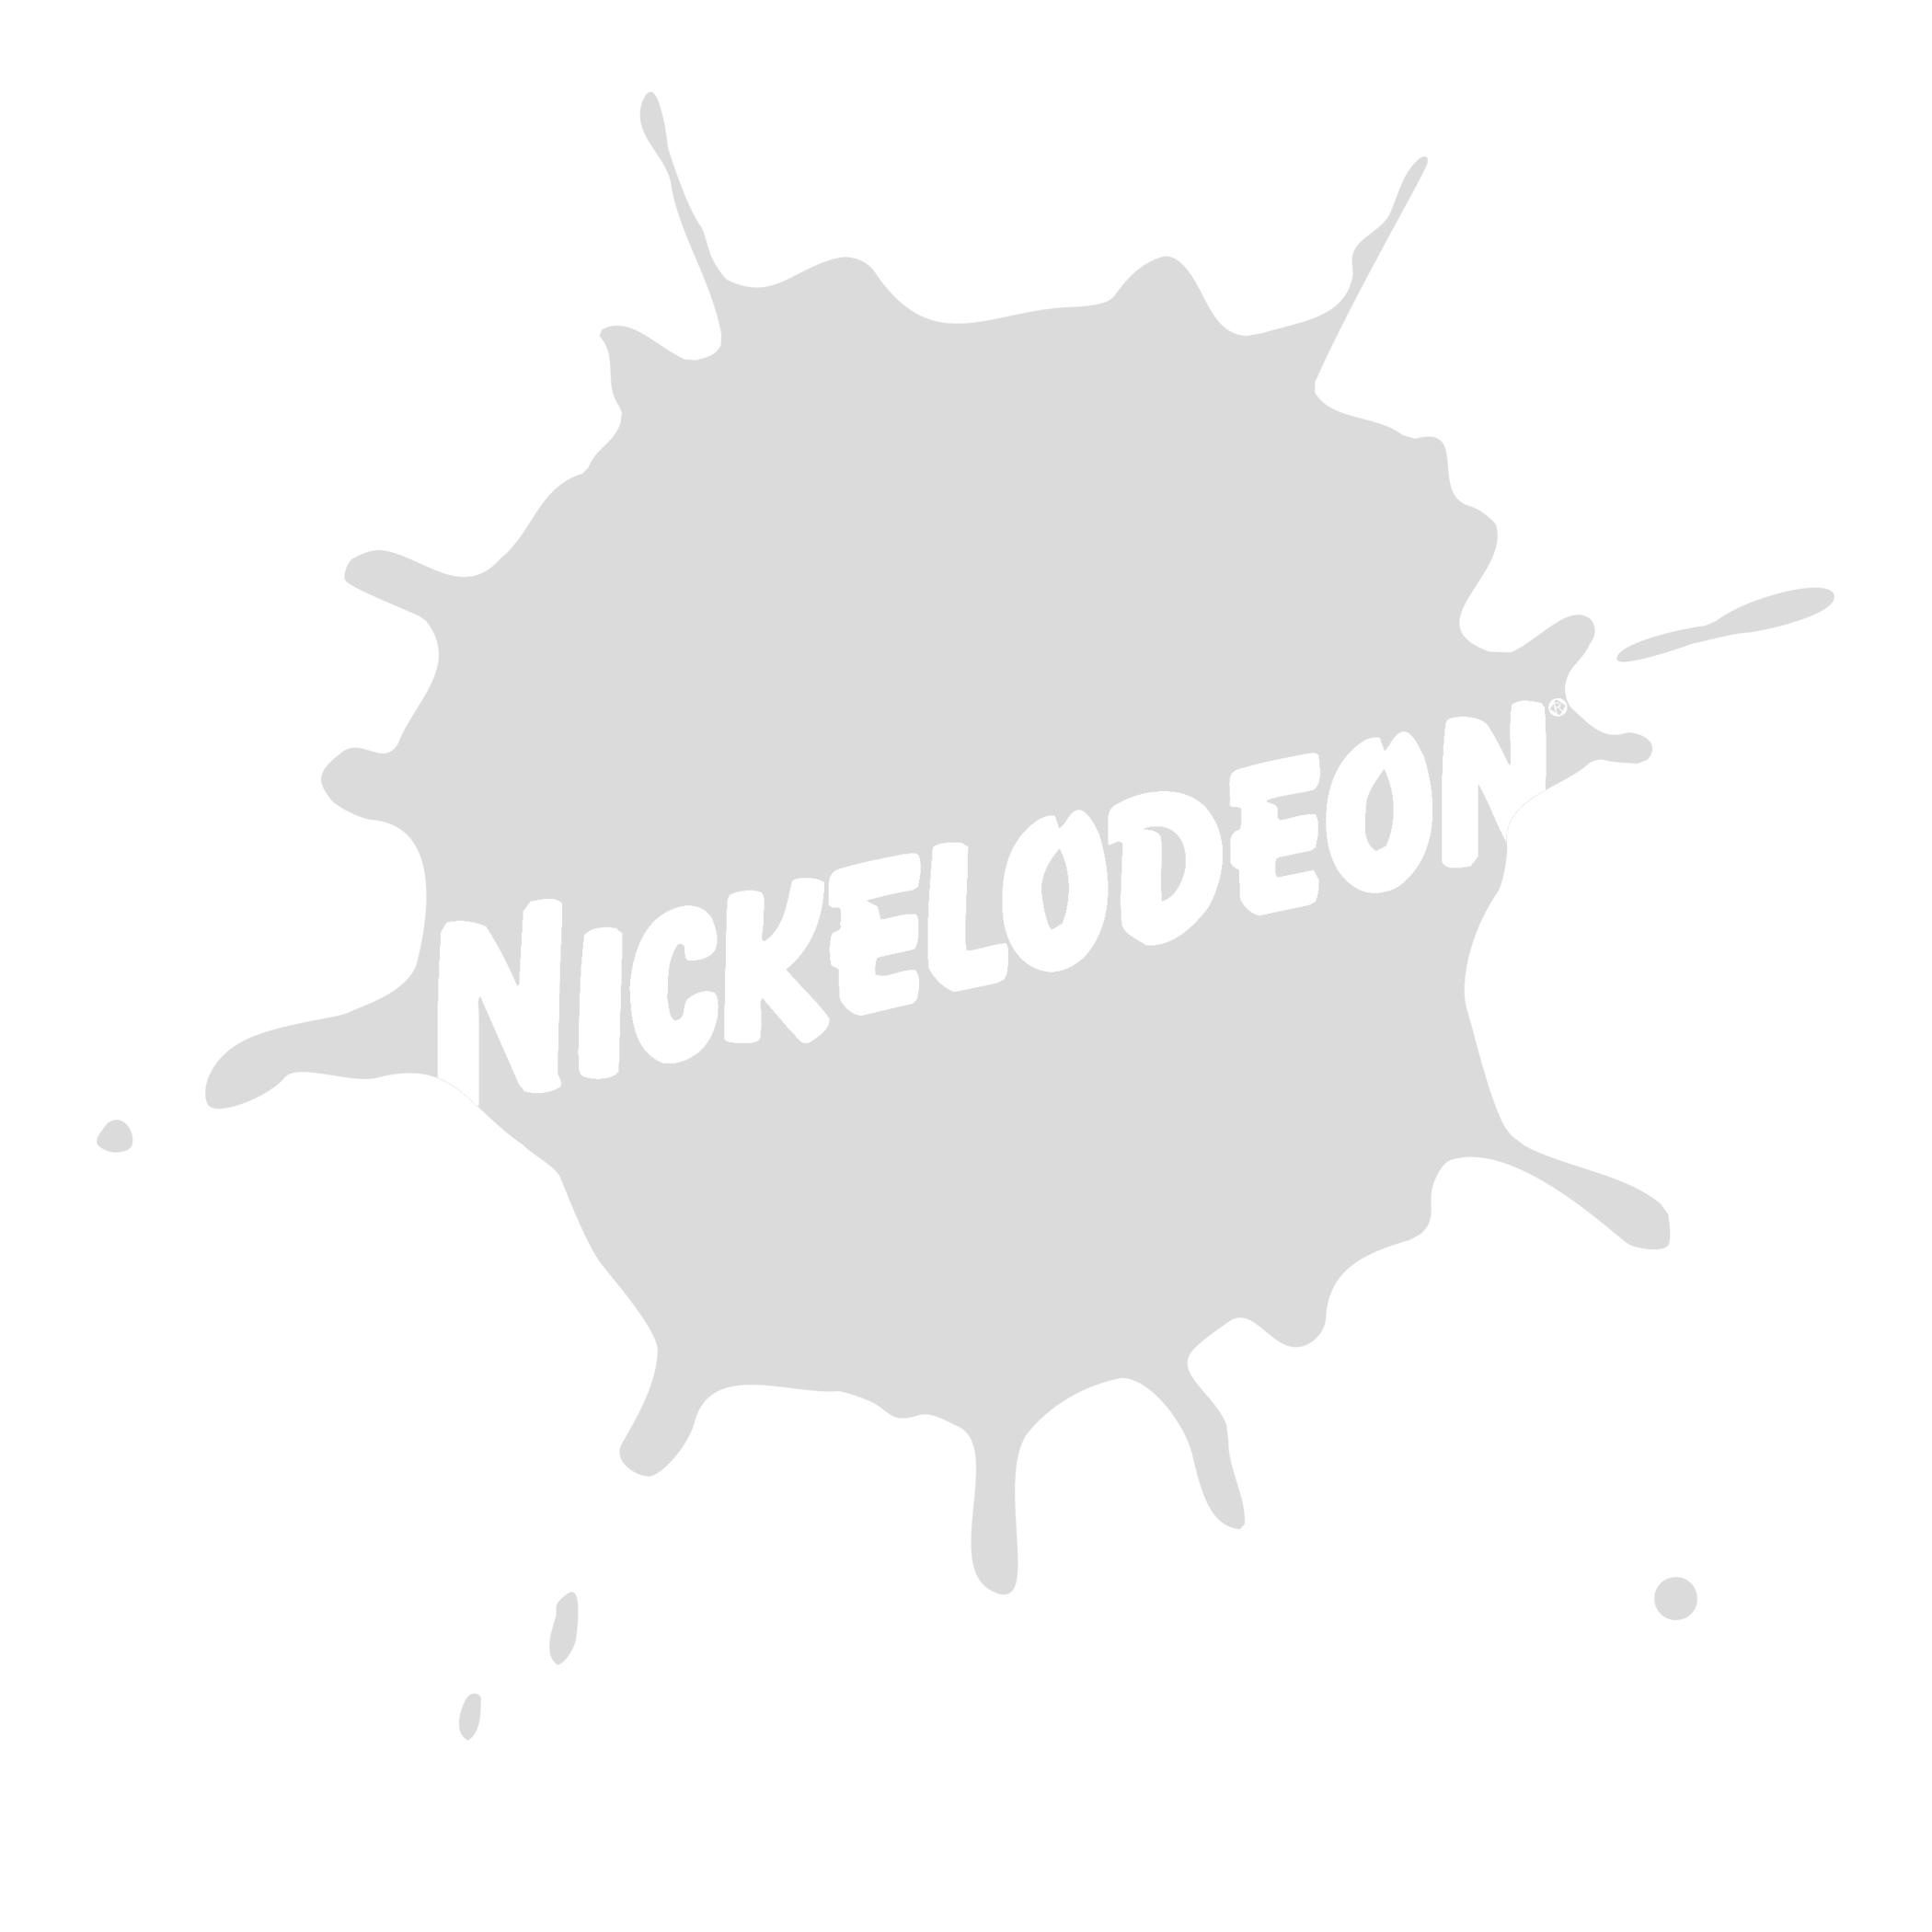 NICKELODEON_GRAY.png